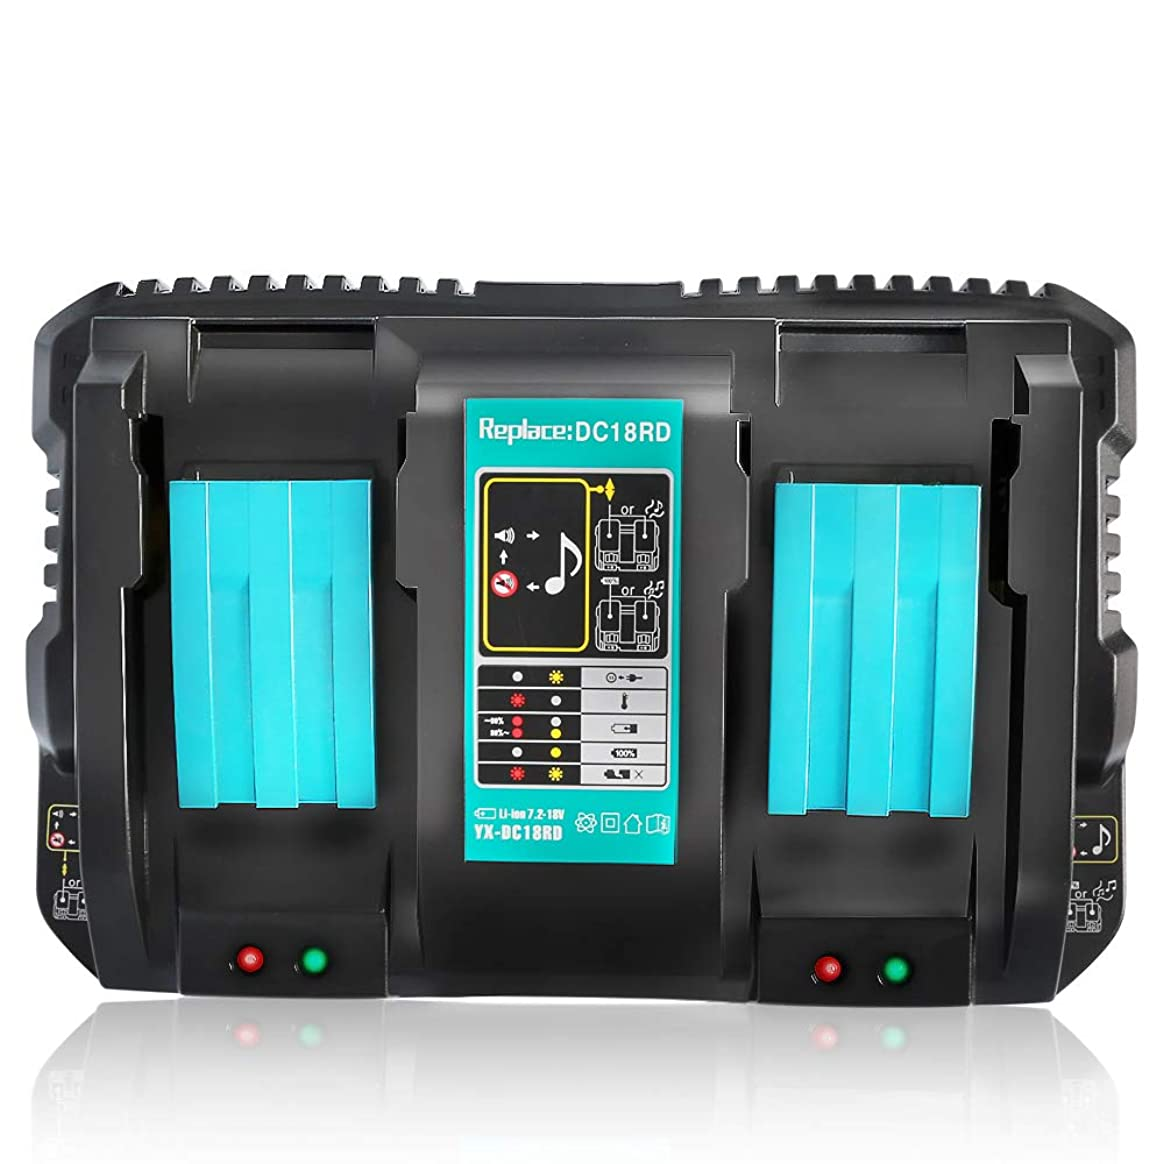 Ybang マキタ DC18RD 互換充電器 2口充電器 マキタ 14.4V/18Vリチウムイオンバッテリ 対応 BL1430 BL1440 BL1450 BL1460 BL1815 BL1830 BL1840 BL1850 BL1860 BL1430B BL1460B BL1830B BL1850B BL1860B など 充電可能 2本同時に充電 本体のみ 充電完了メロディー付き 1年保証